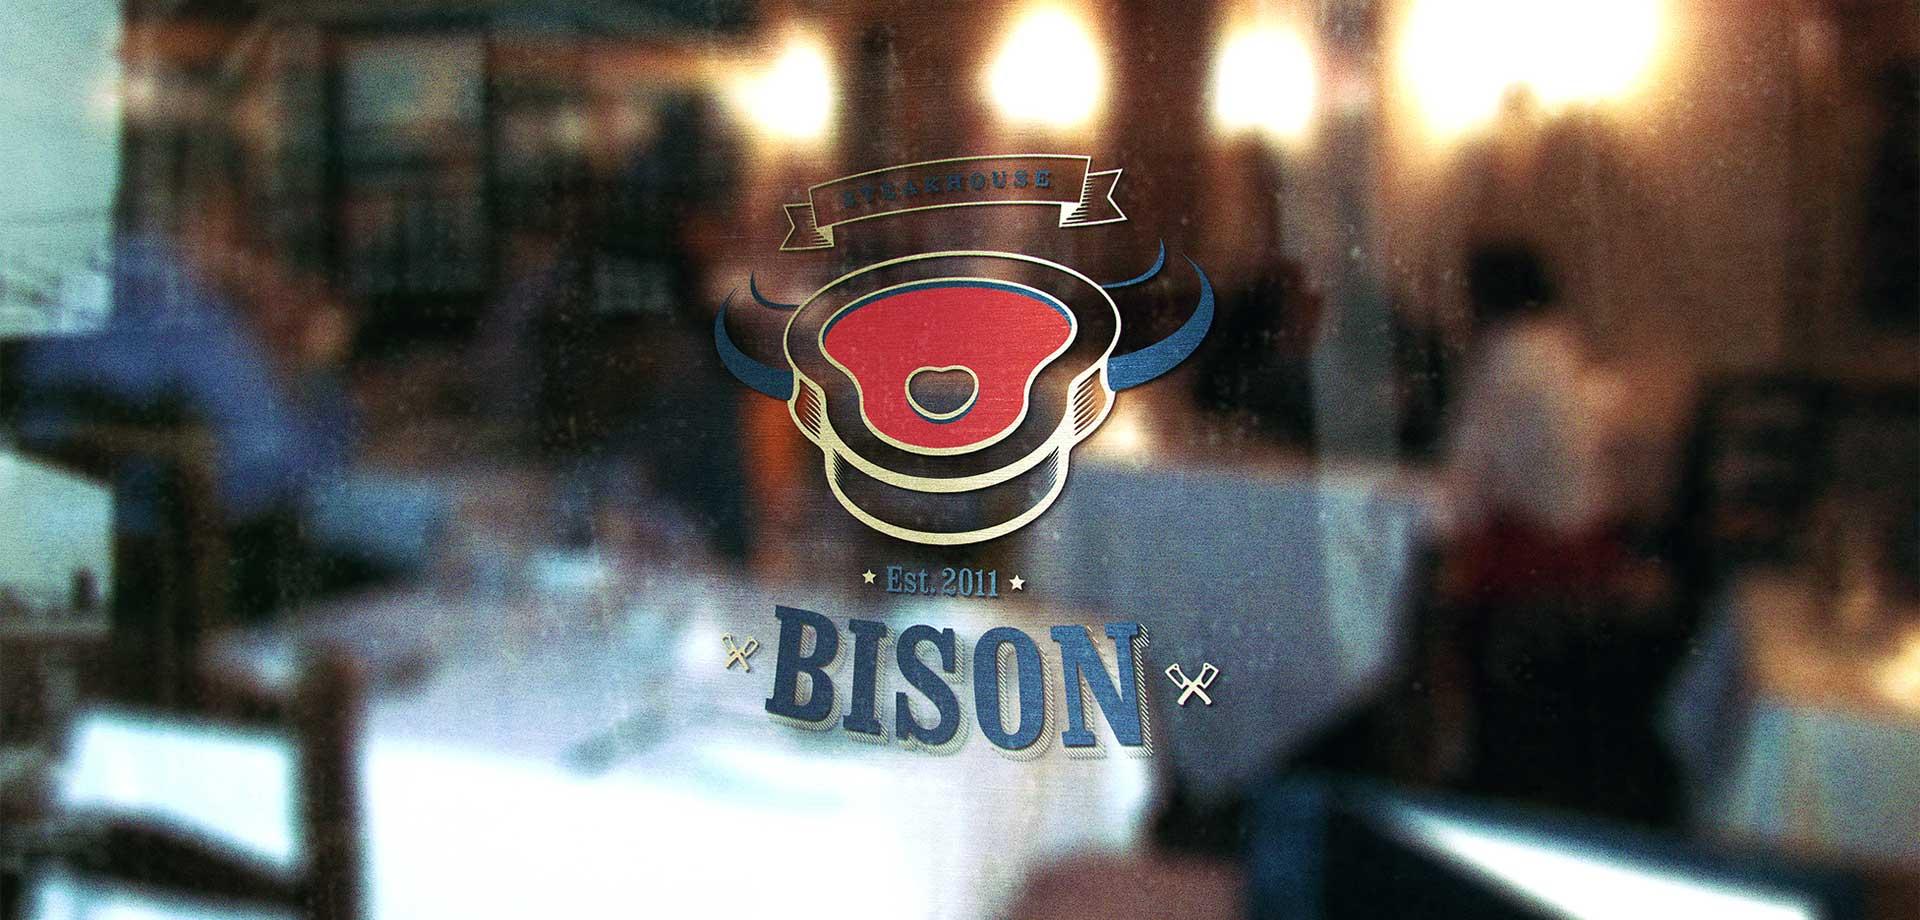 Дизайн сайта и брендинг bison steakhouse